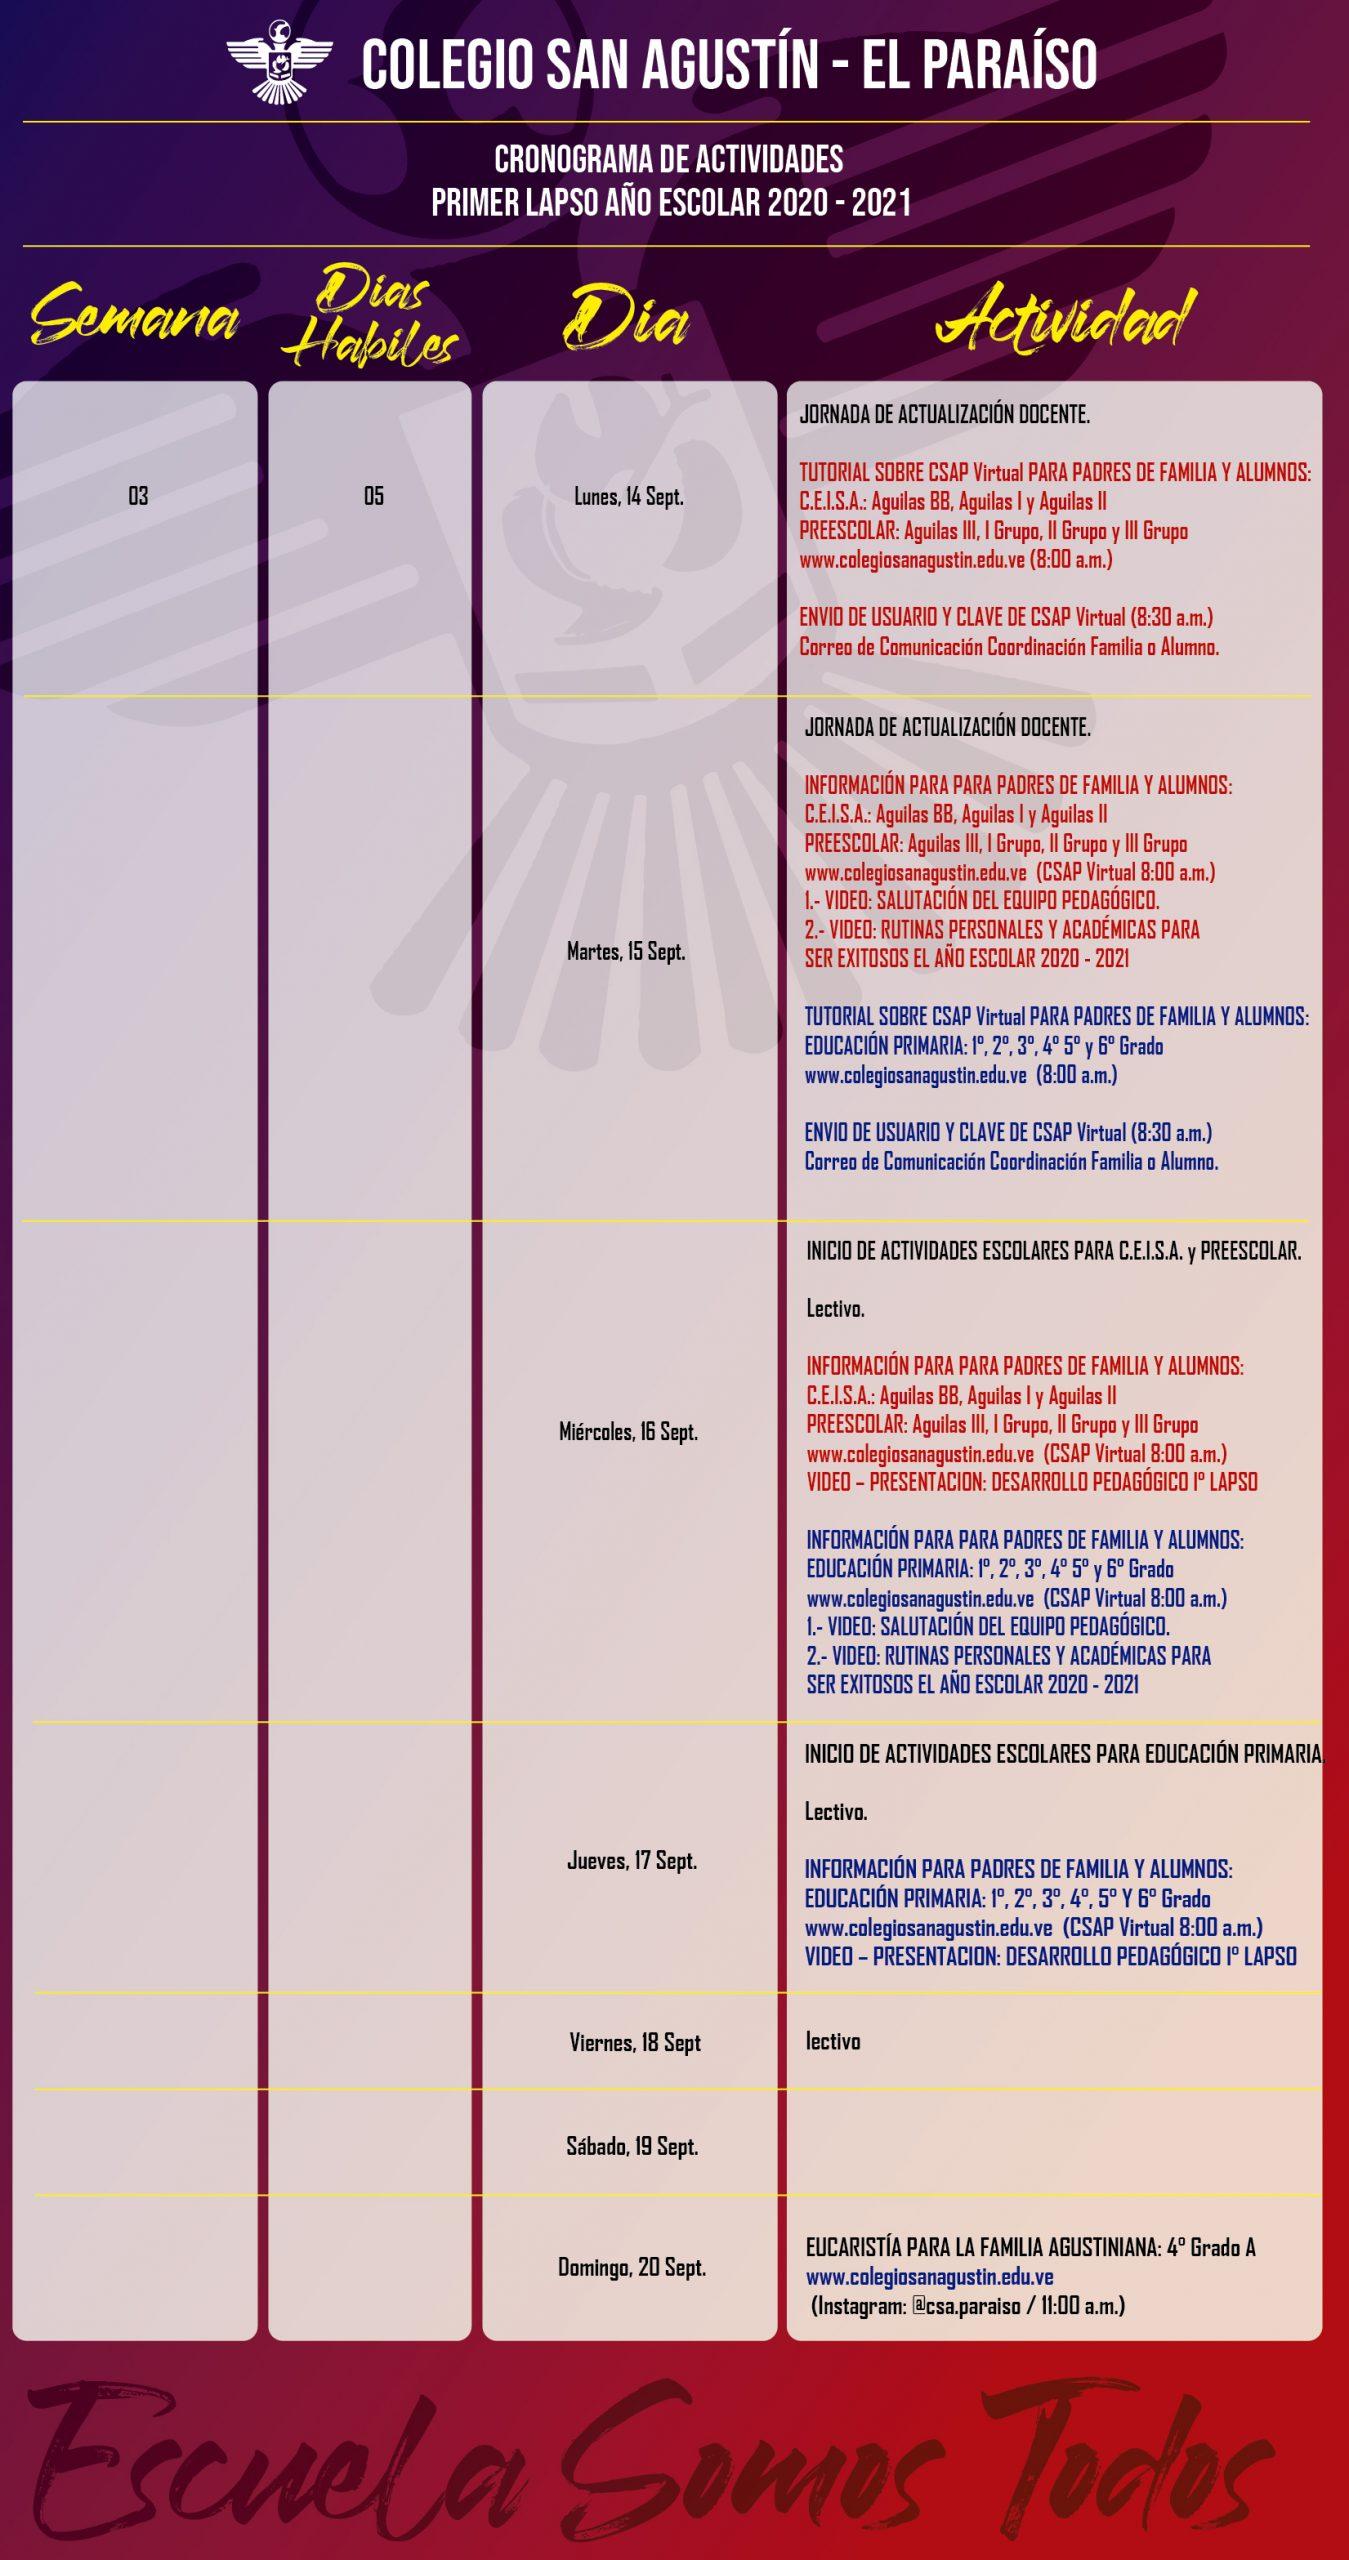 calendario Colegio San agustin x semana_Mesa de trabajo 1 copia